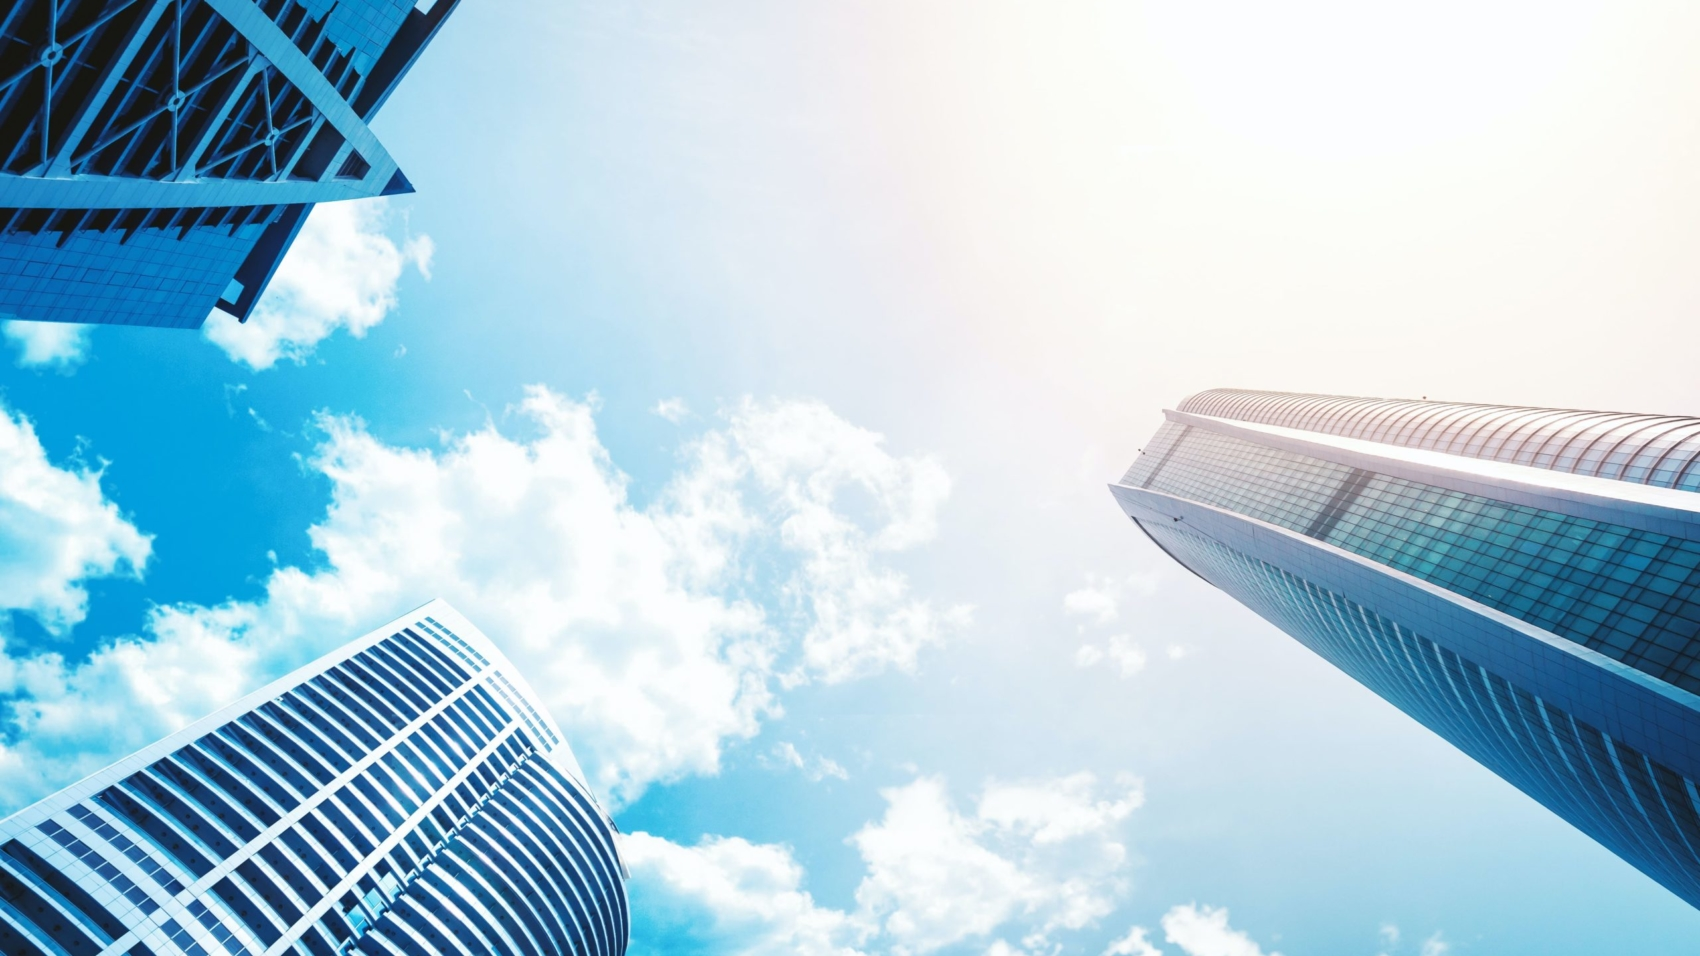 architectural-design-architecture-blue-sky-buildings-442577-min